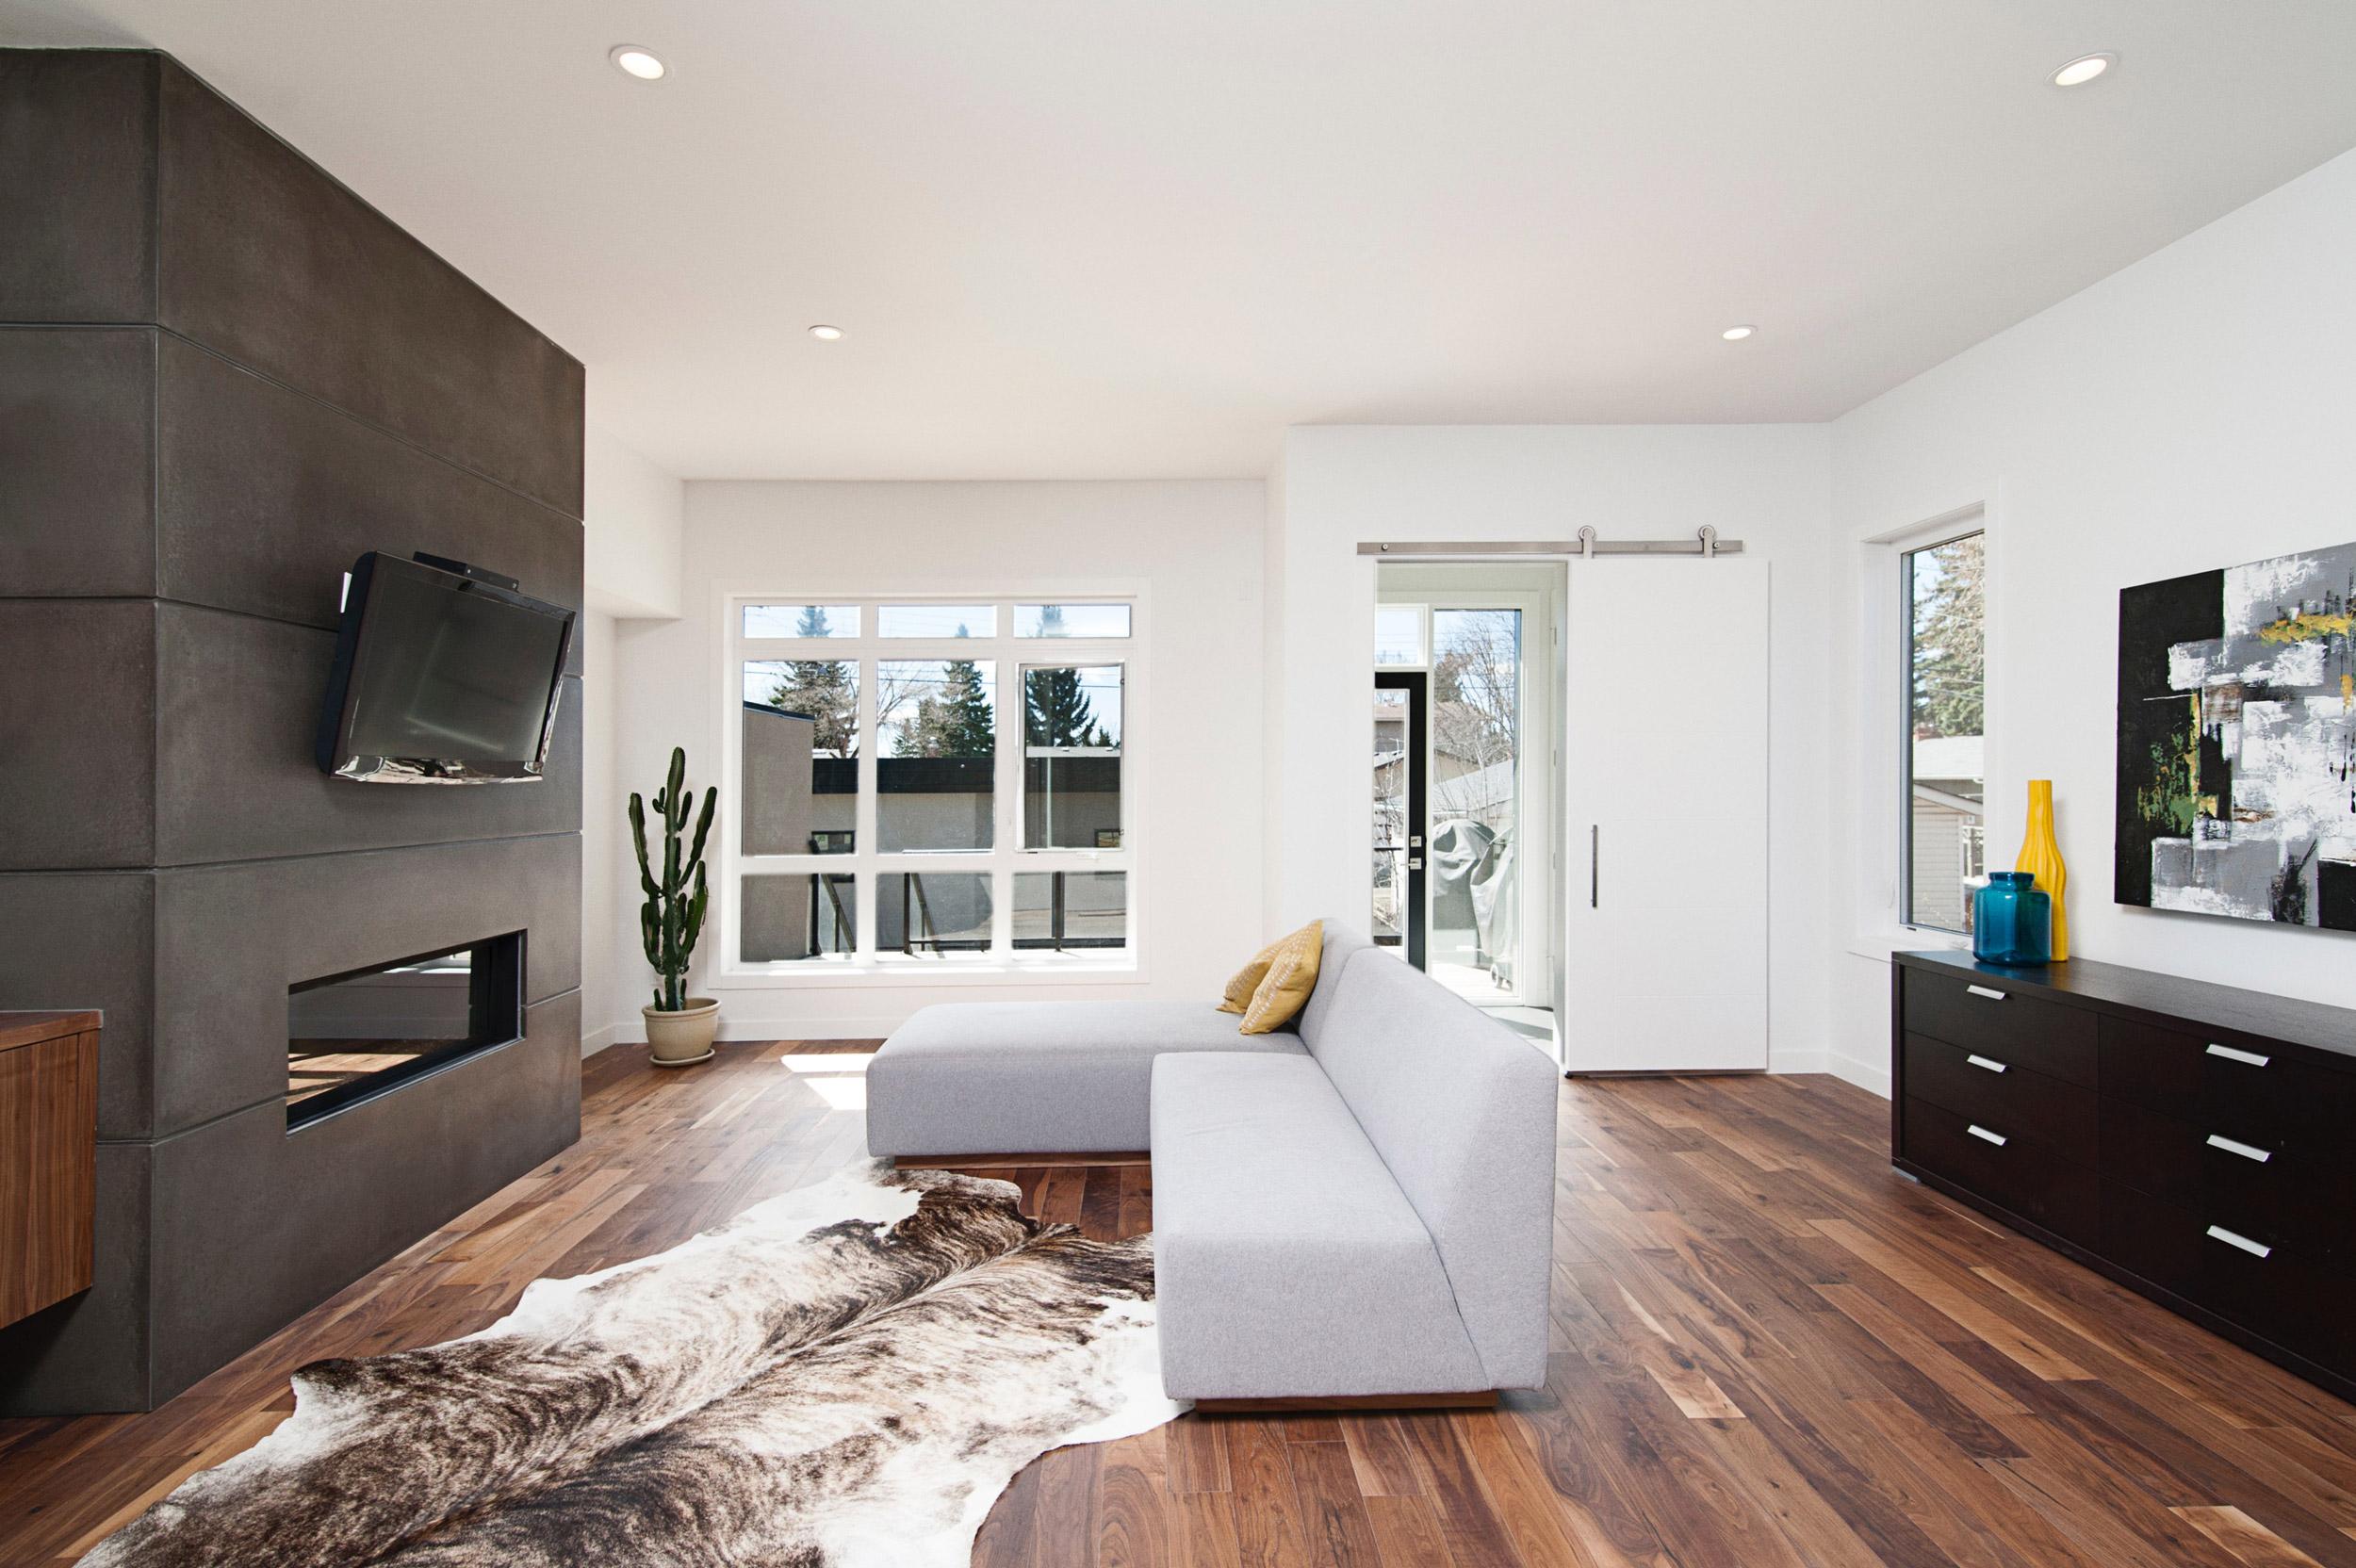 casa-wood-floors-bilbao-engineered-wood.jpg